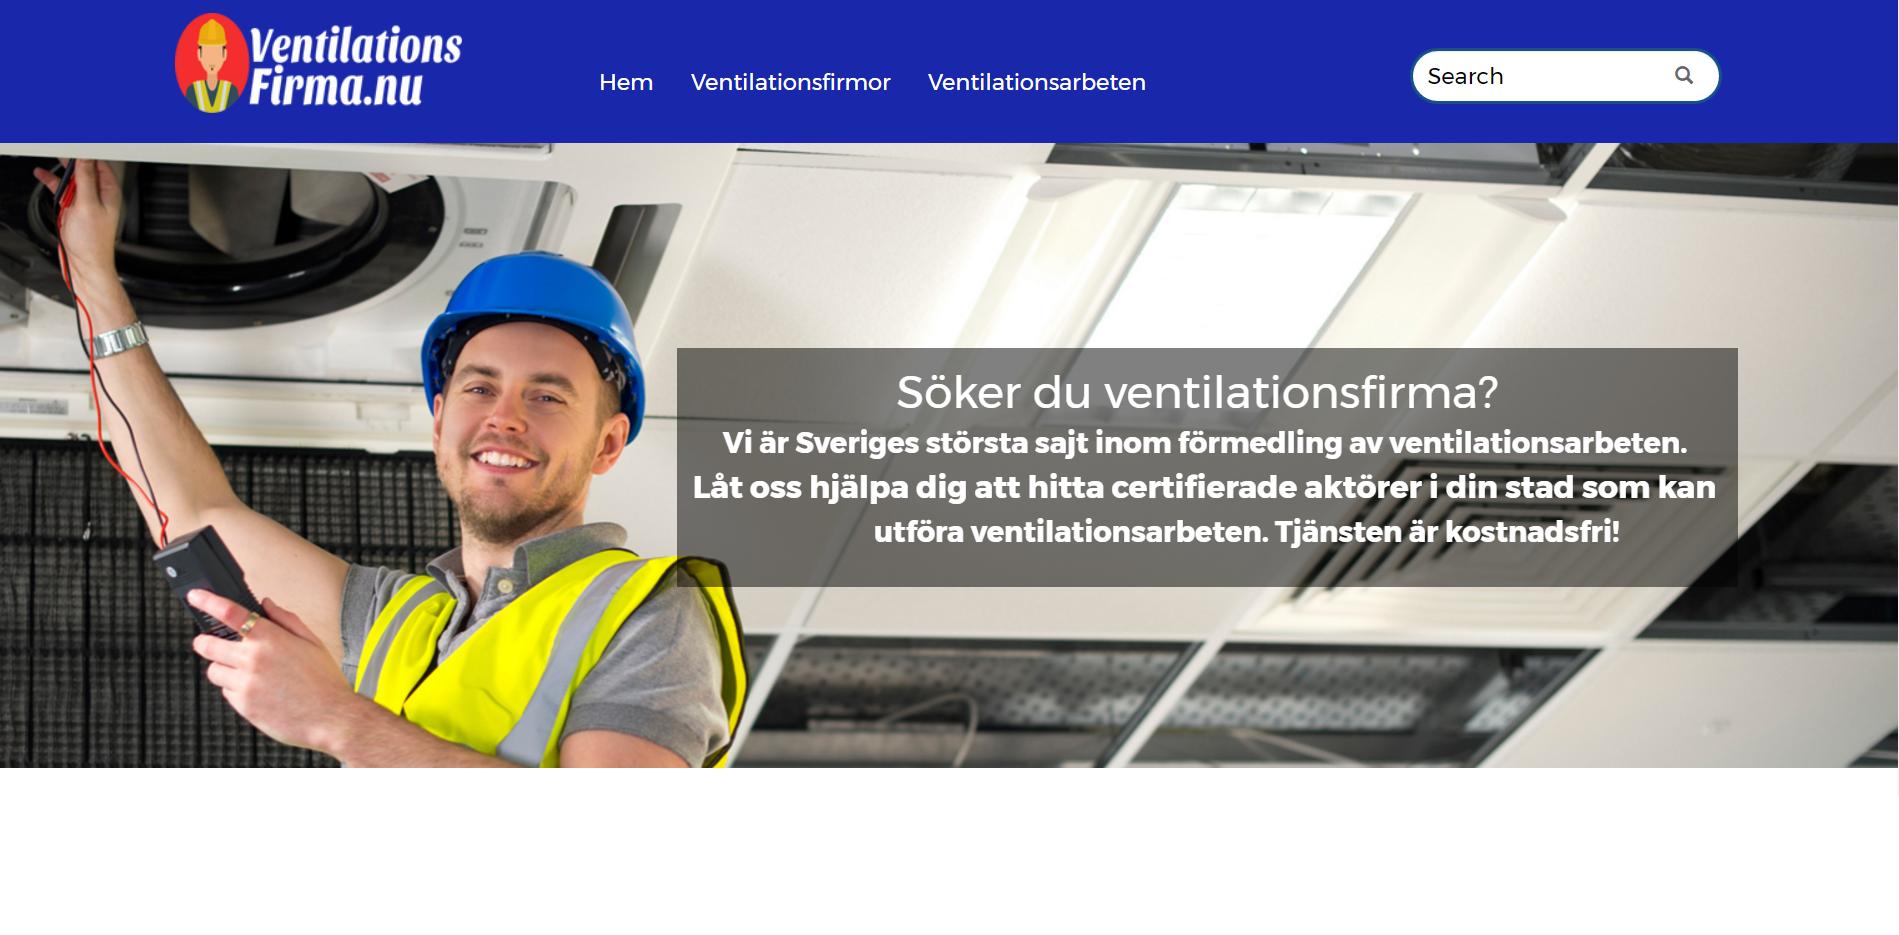 Ventilationsfirma.nu